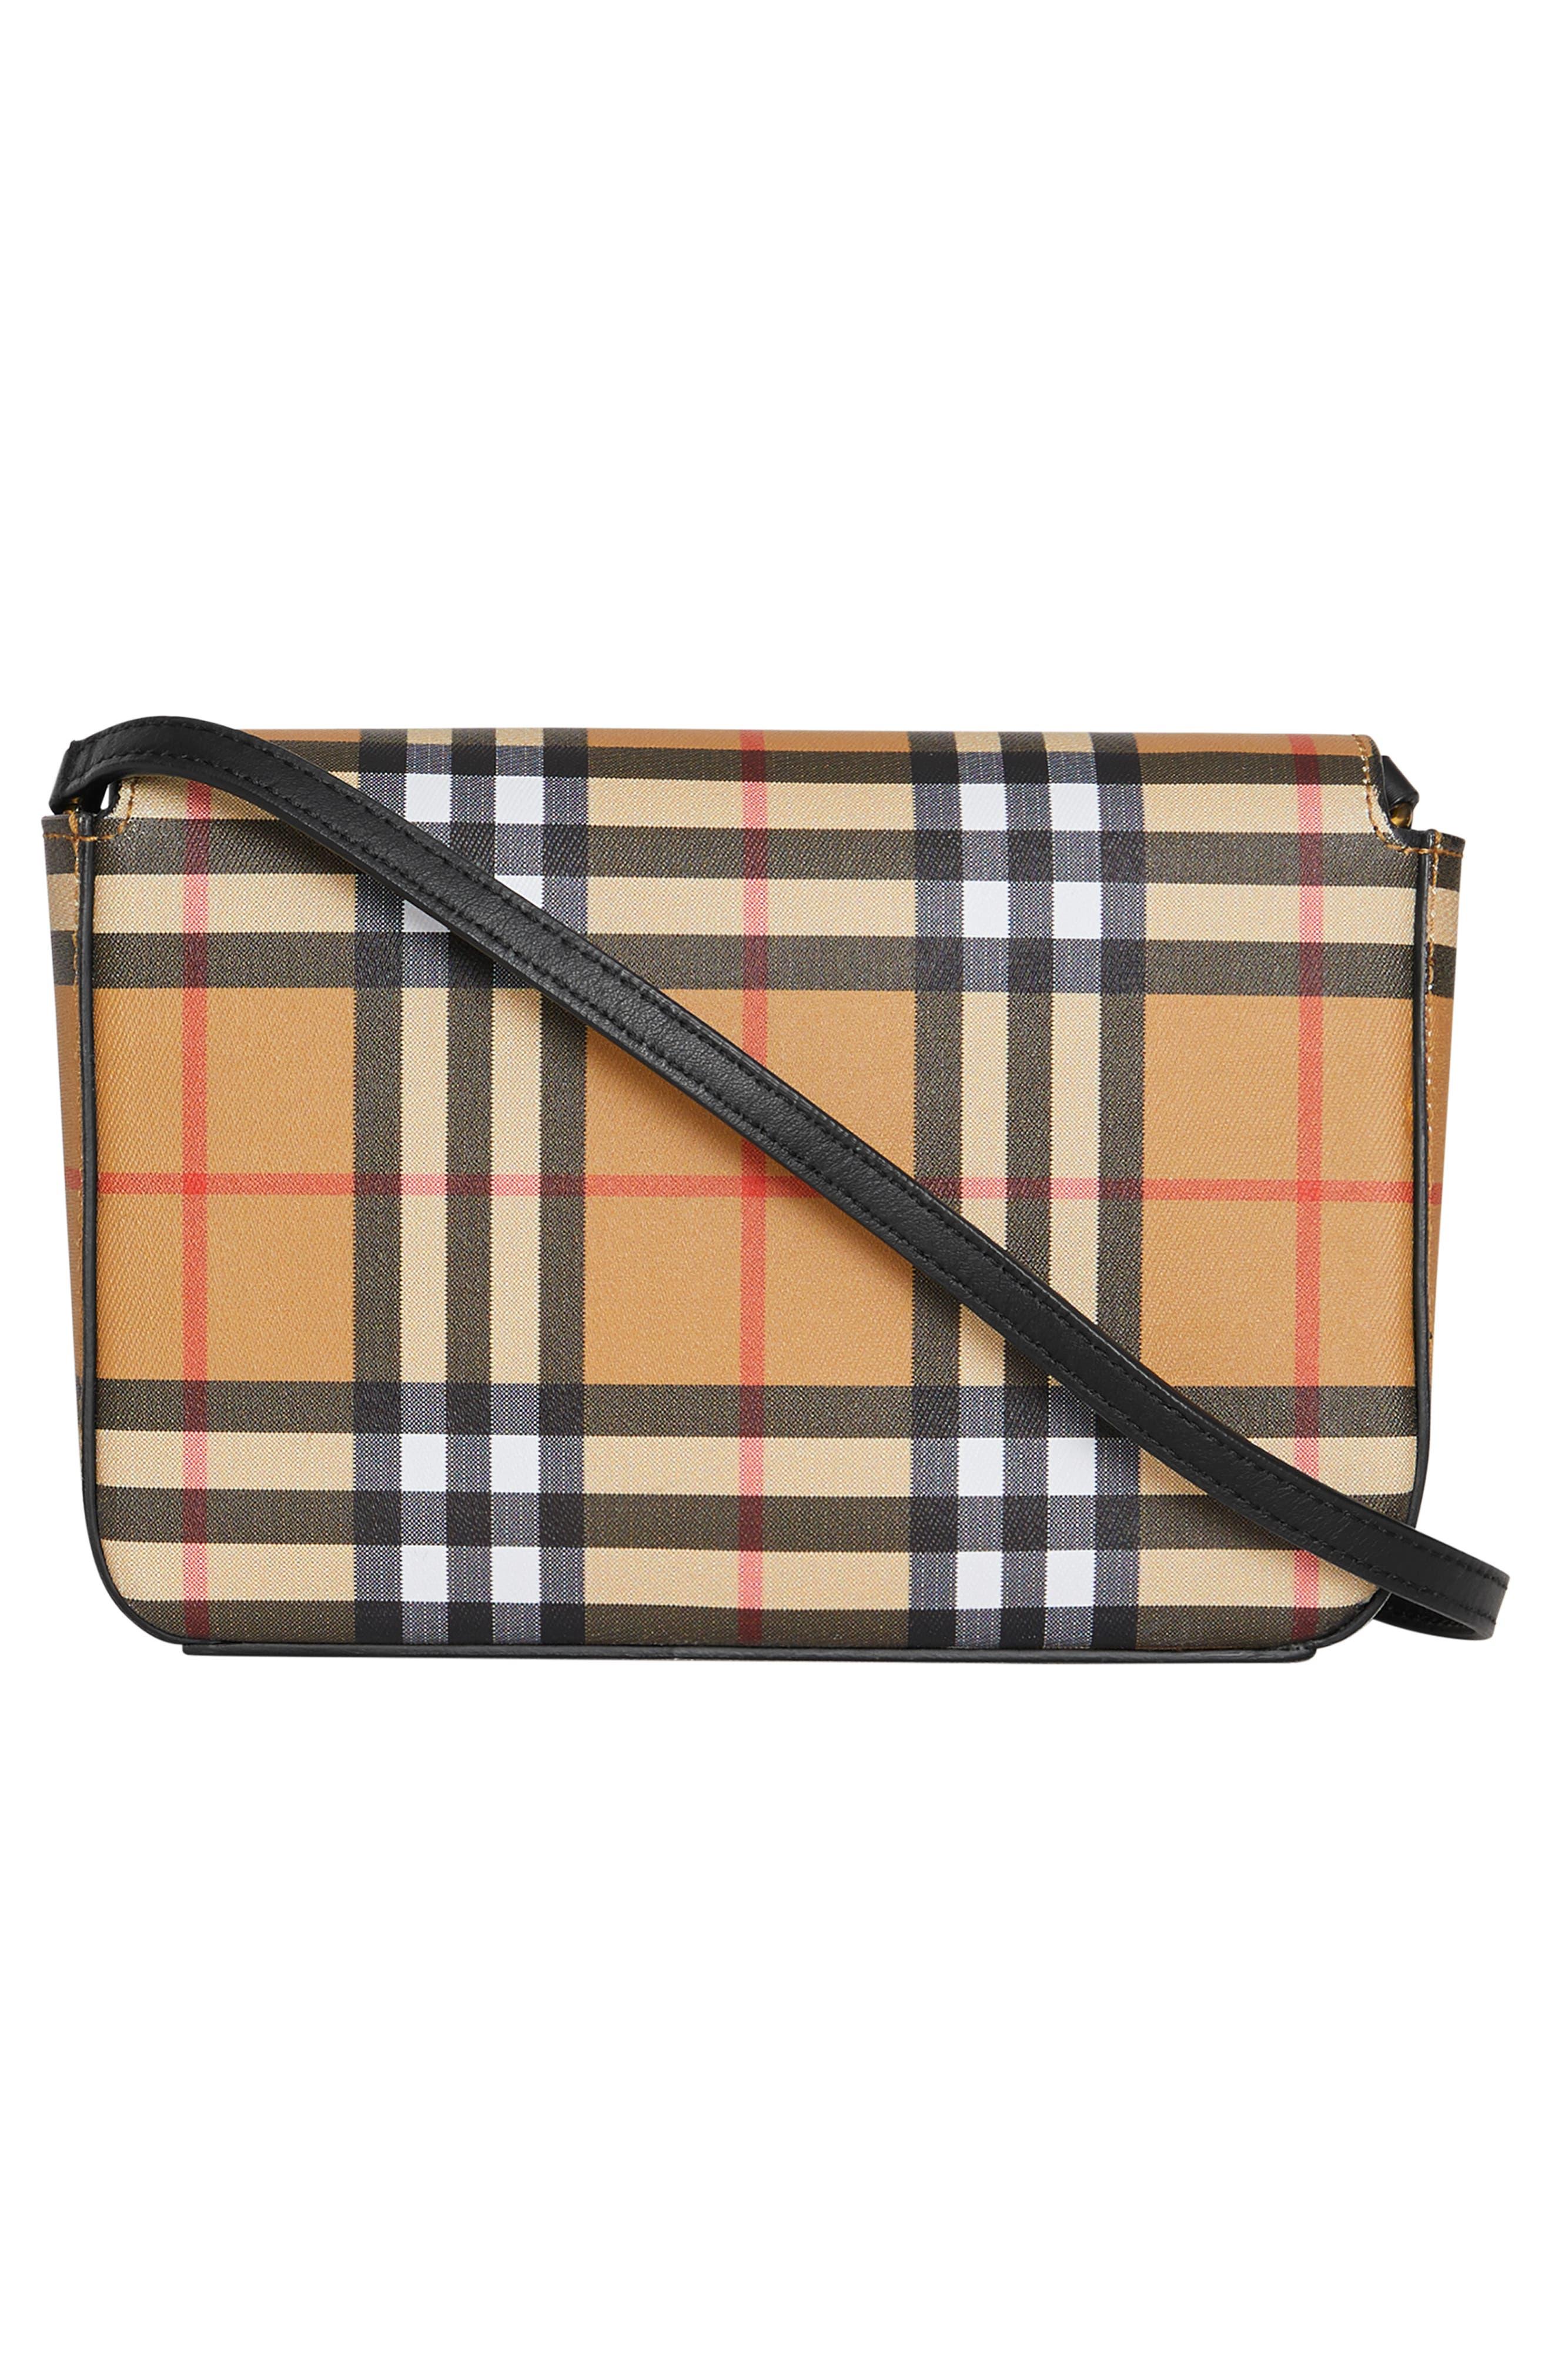 BURBERRY, Hampshire Vintage Check Crossbody Bag, Alternate thumbnail 3, color, BLACK